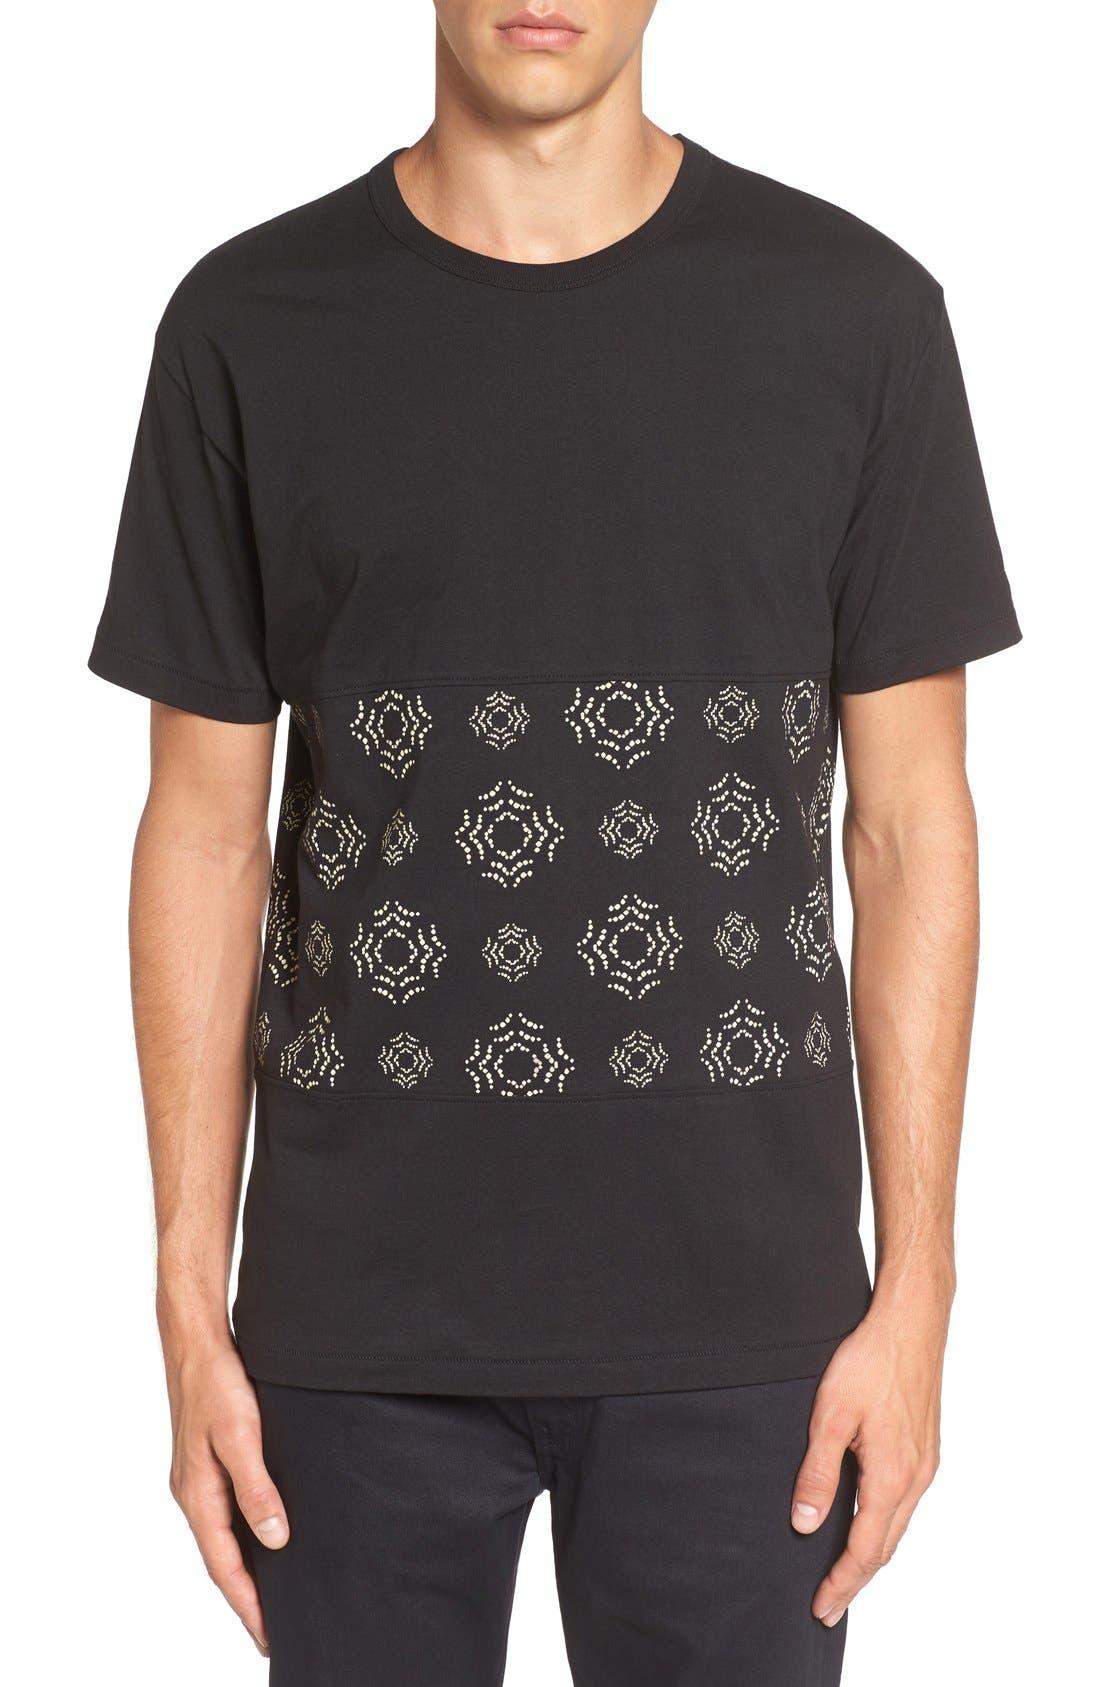 Imperial Motion 'Kaleidescope' Premium T-Shirt